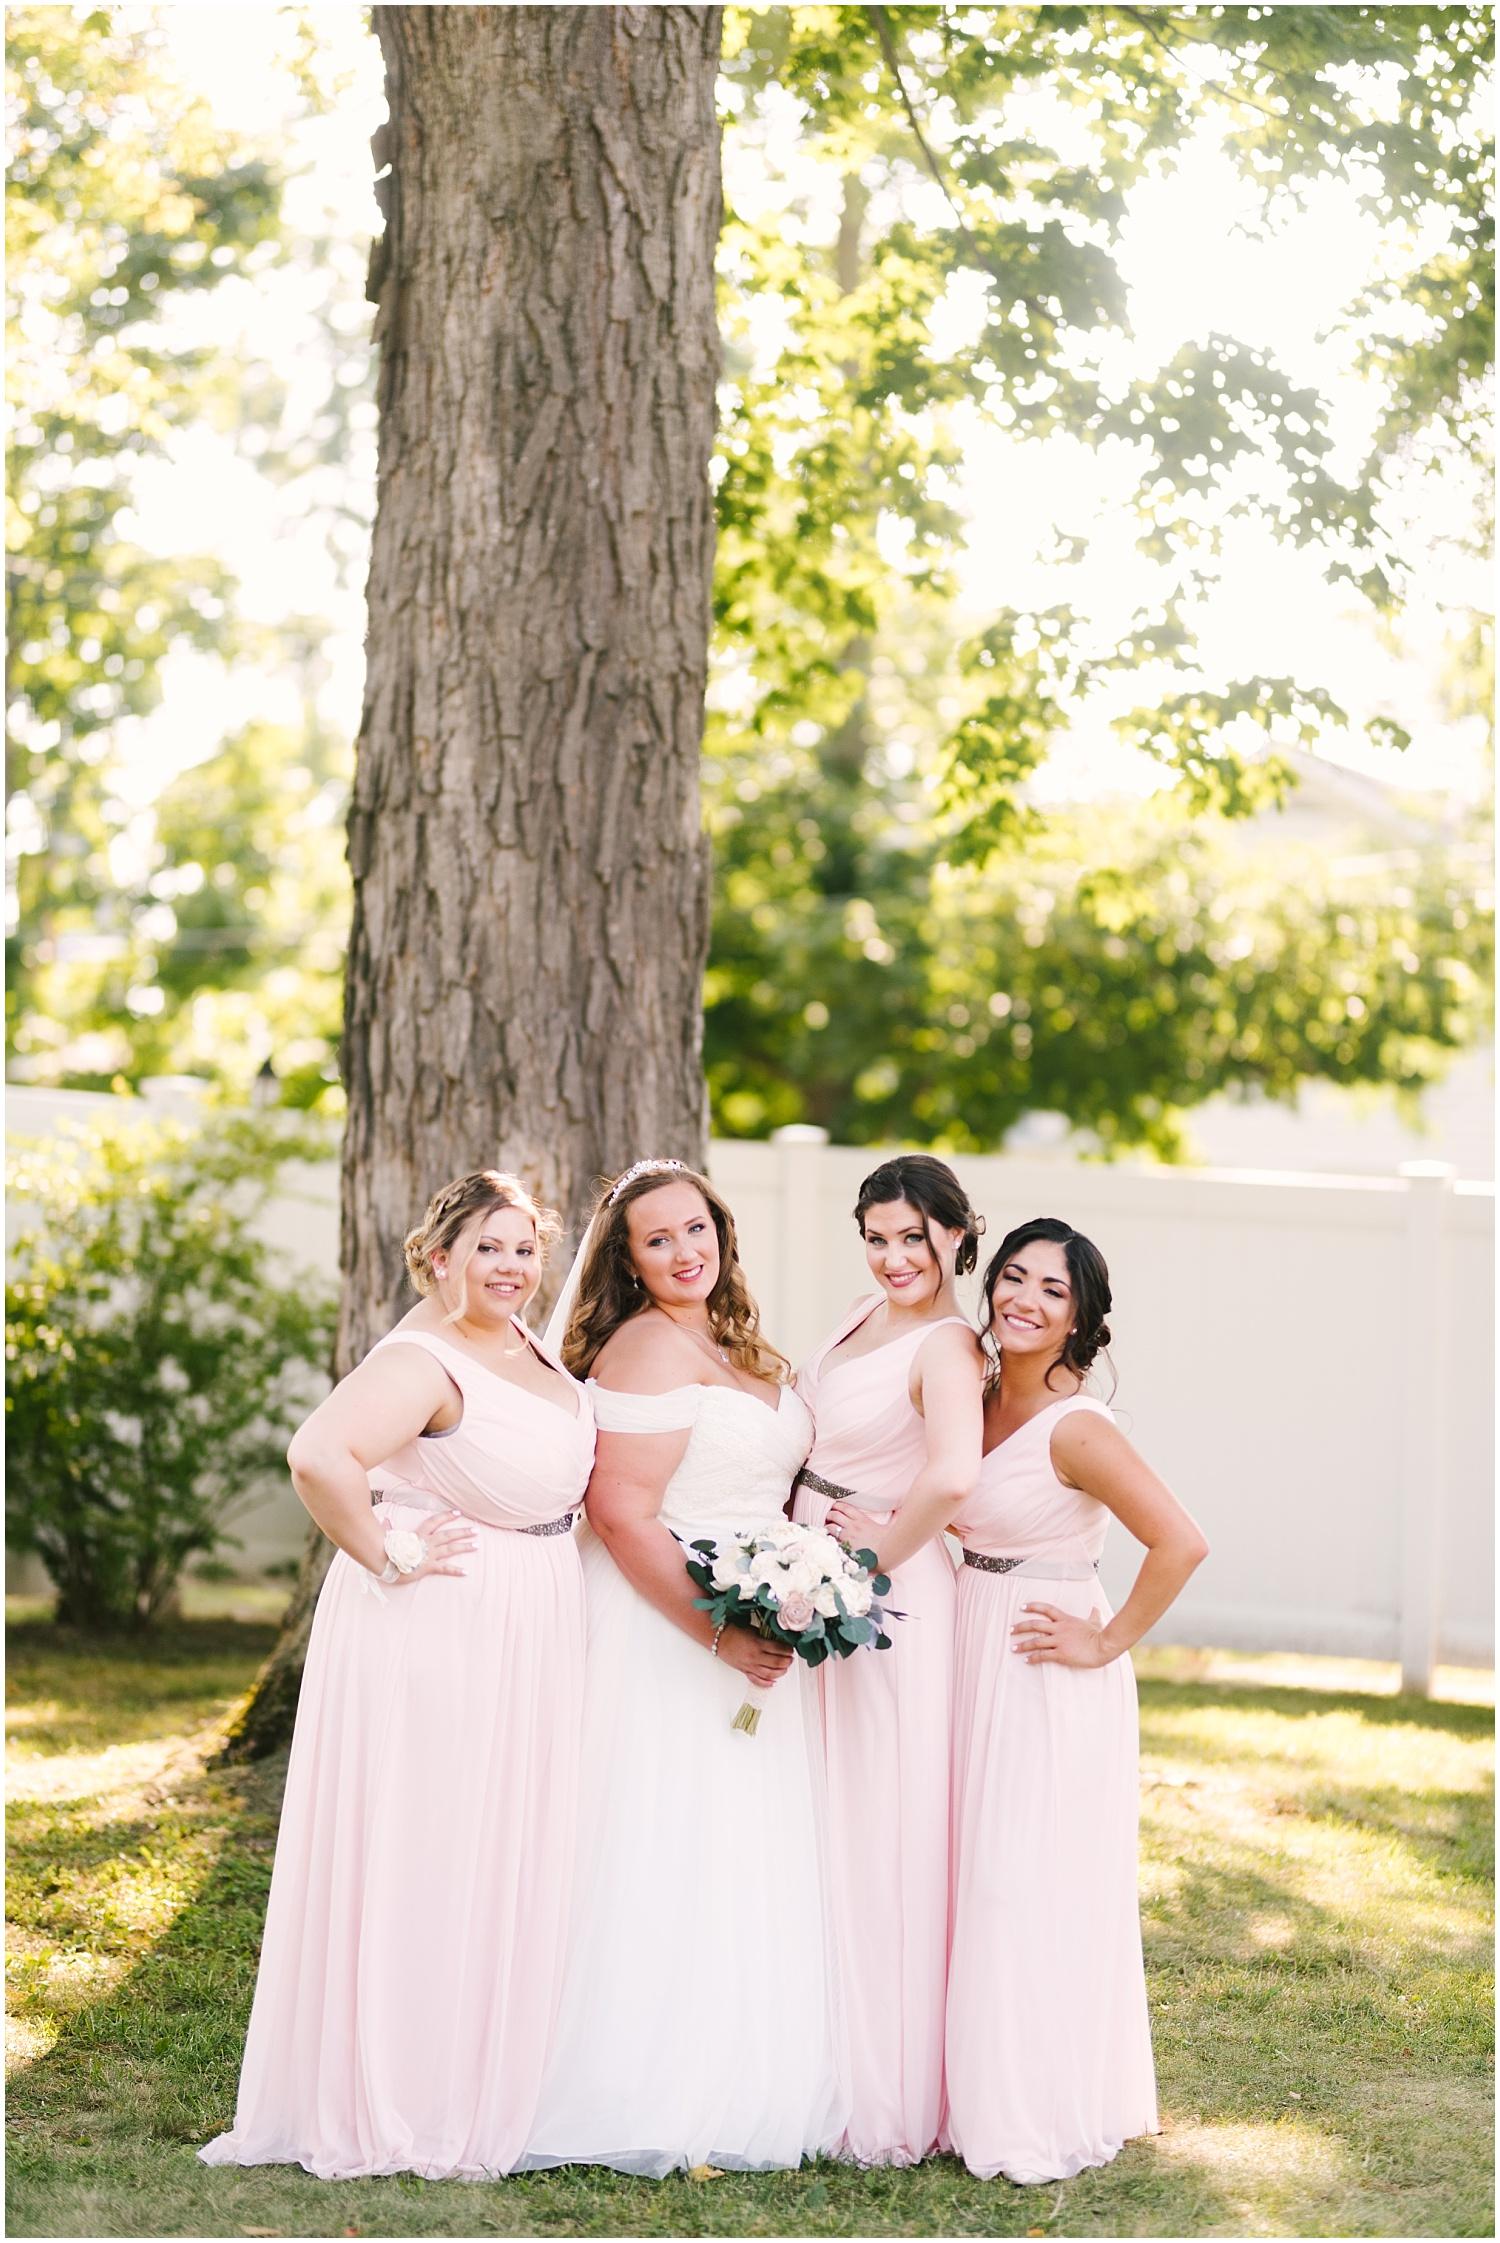 the+avon+inn+wedding+photographer (62).jpg